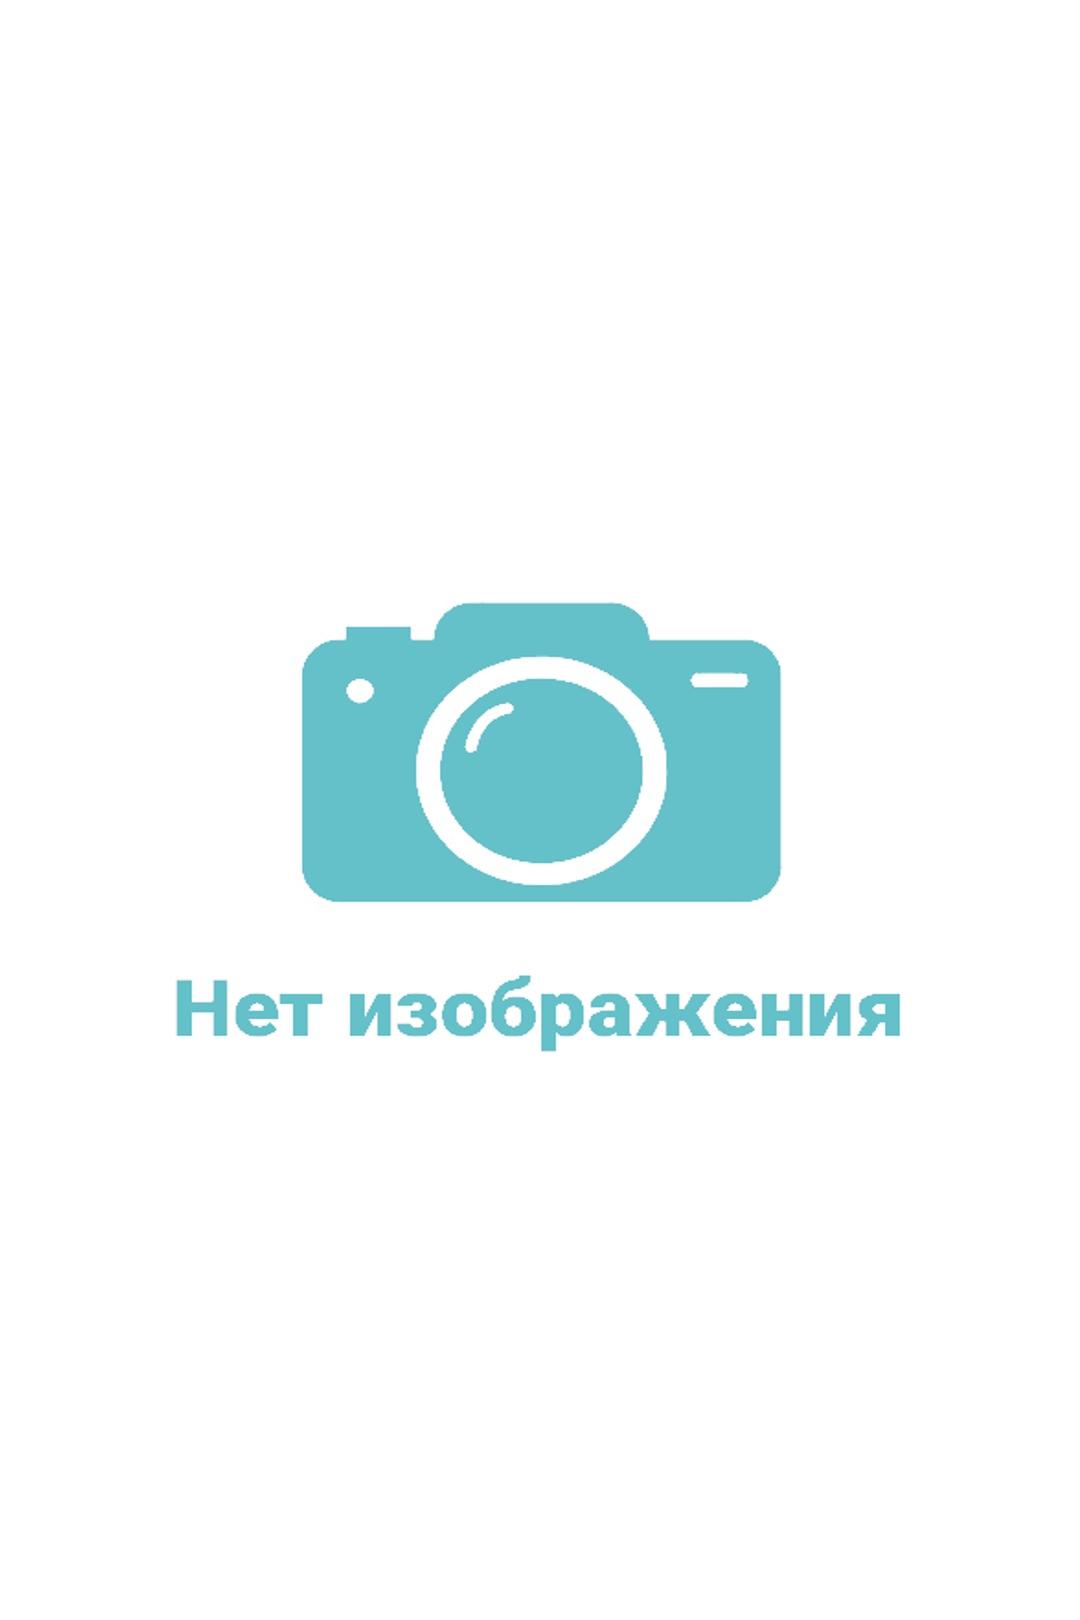 Массажист Хольнов Павел Валентинович